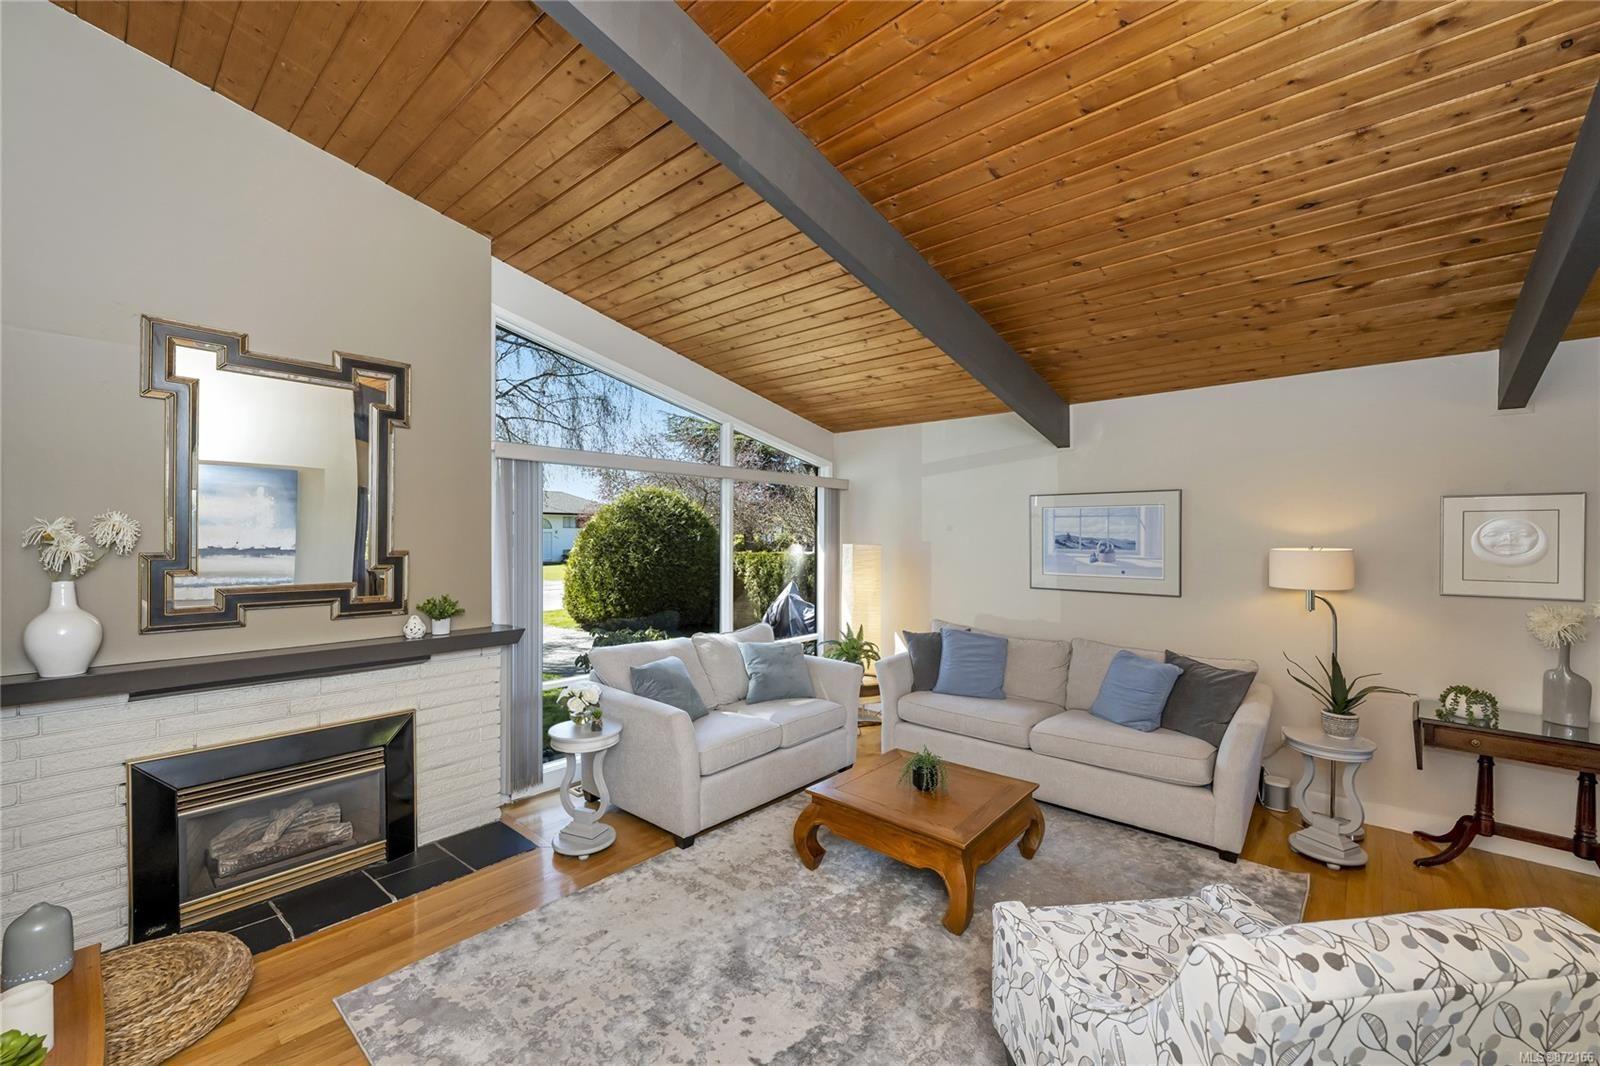 Photo 2: Photos: 1690 Blair Ave in : SE Lambrick Park House for sale (Saanich East)  : MLS®# 872166